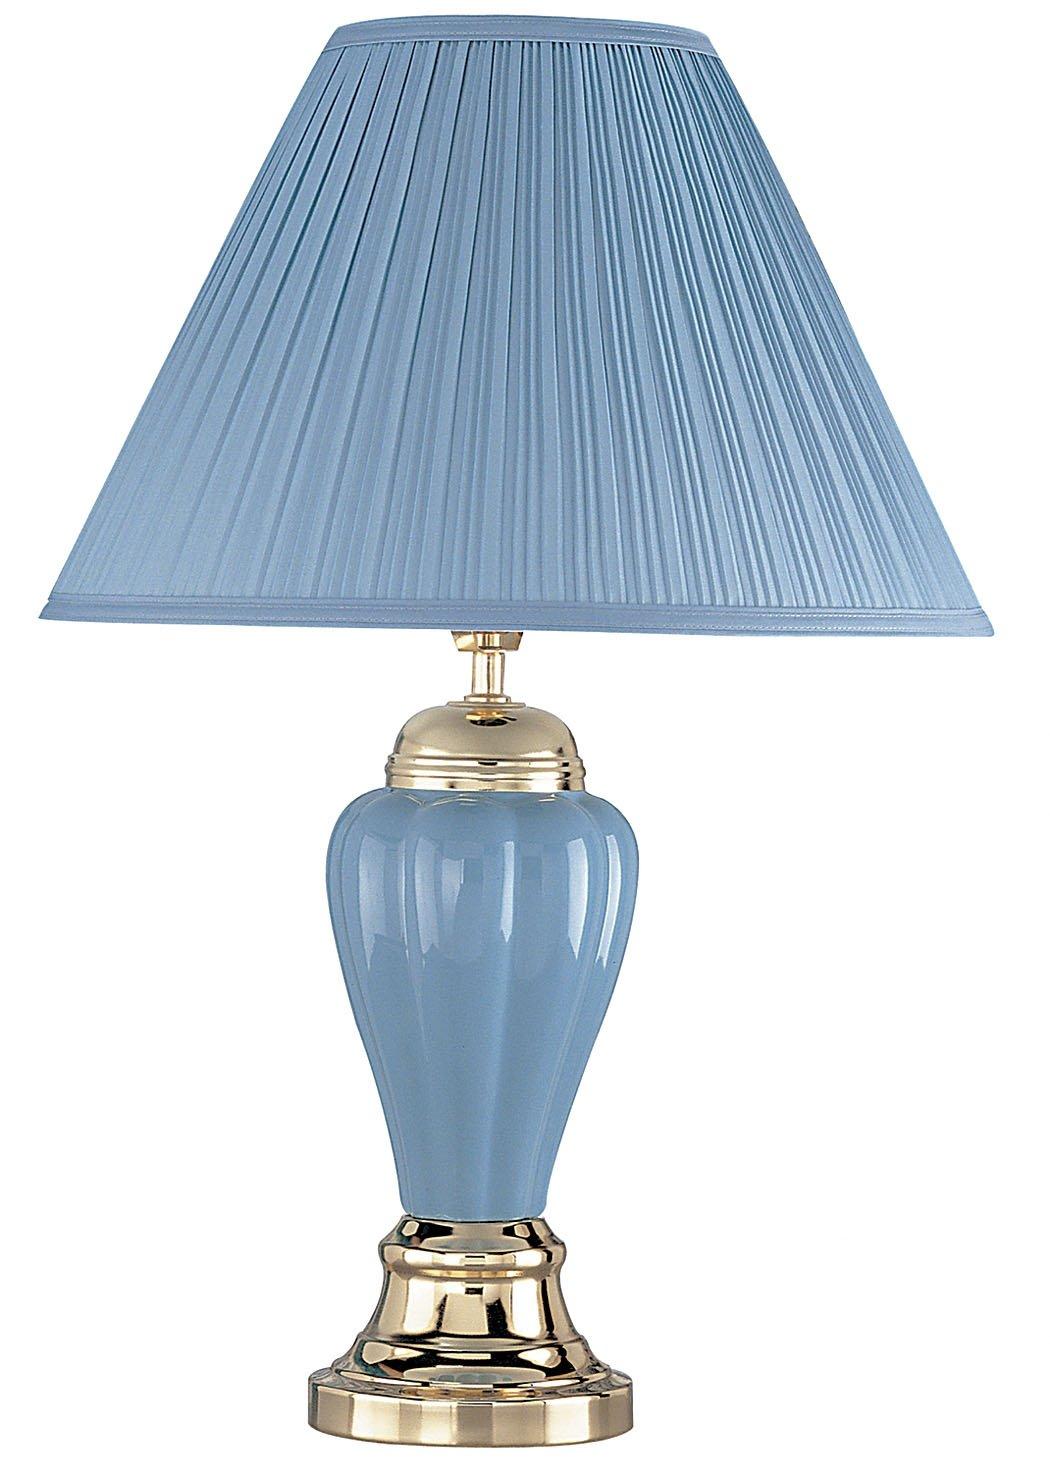 ORE International 6117BL 27-Inch 60-Watt Ceramic Table Lamp, Blue ...